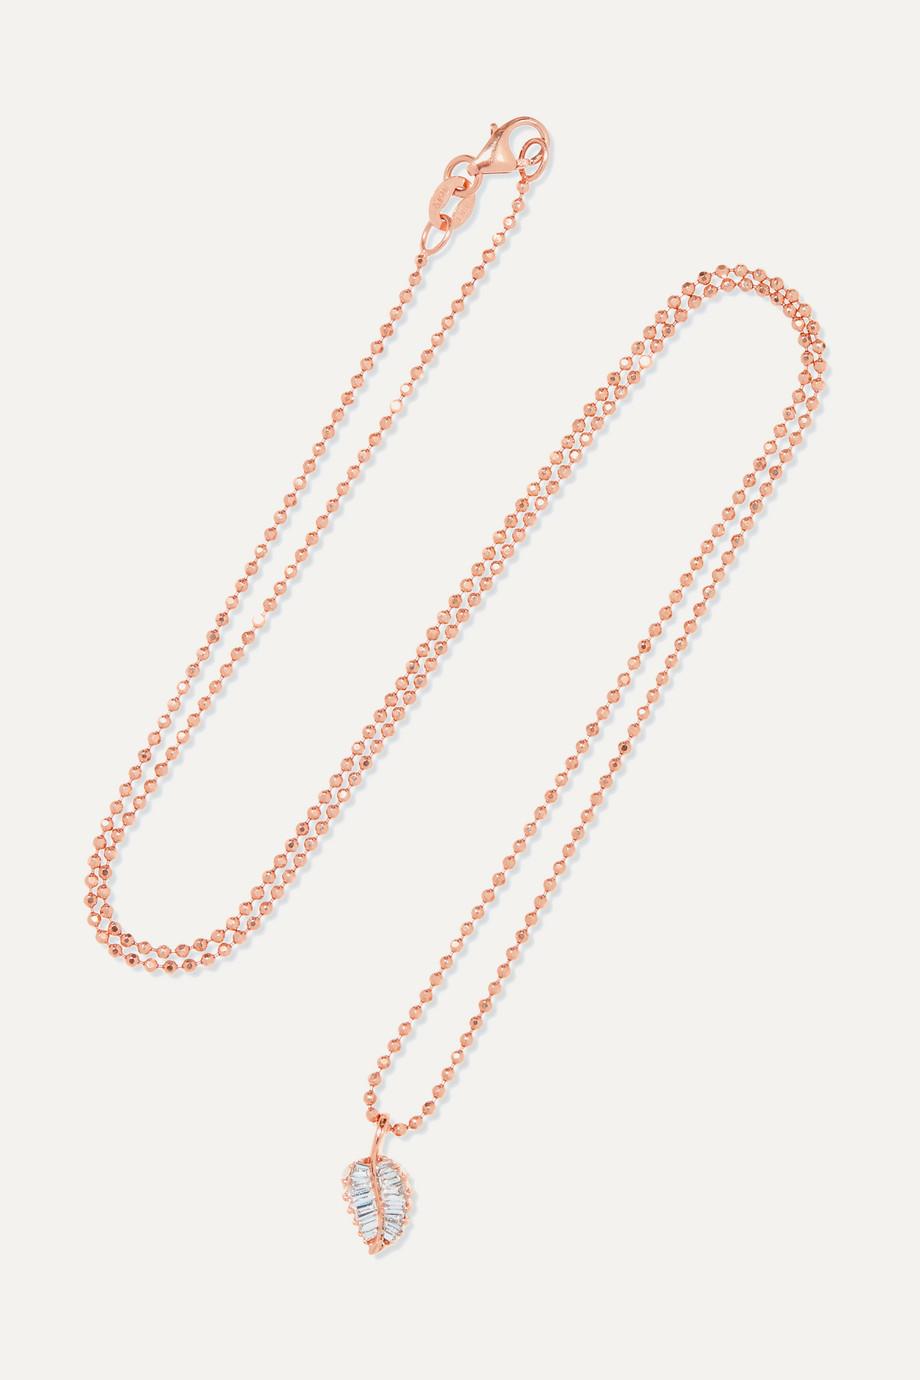 Anita Ko Collier en or rose 18 carats et diamants